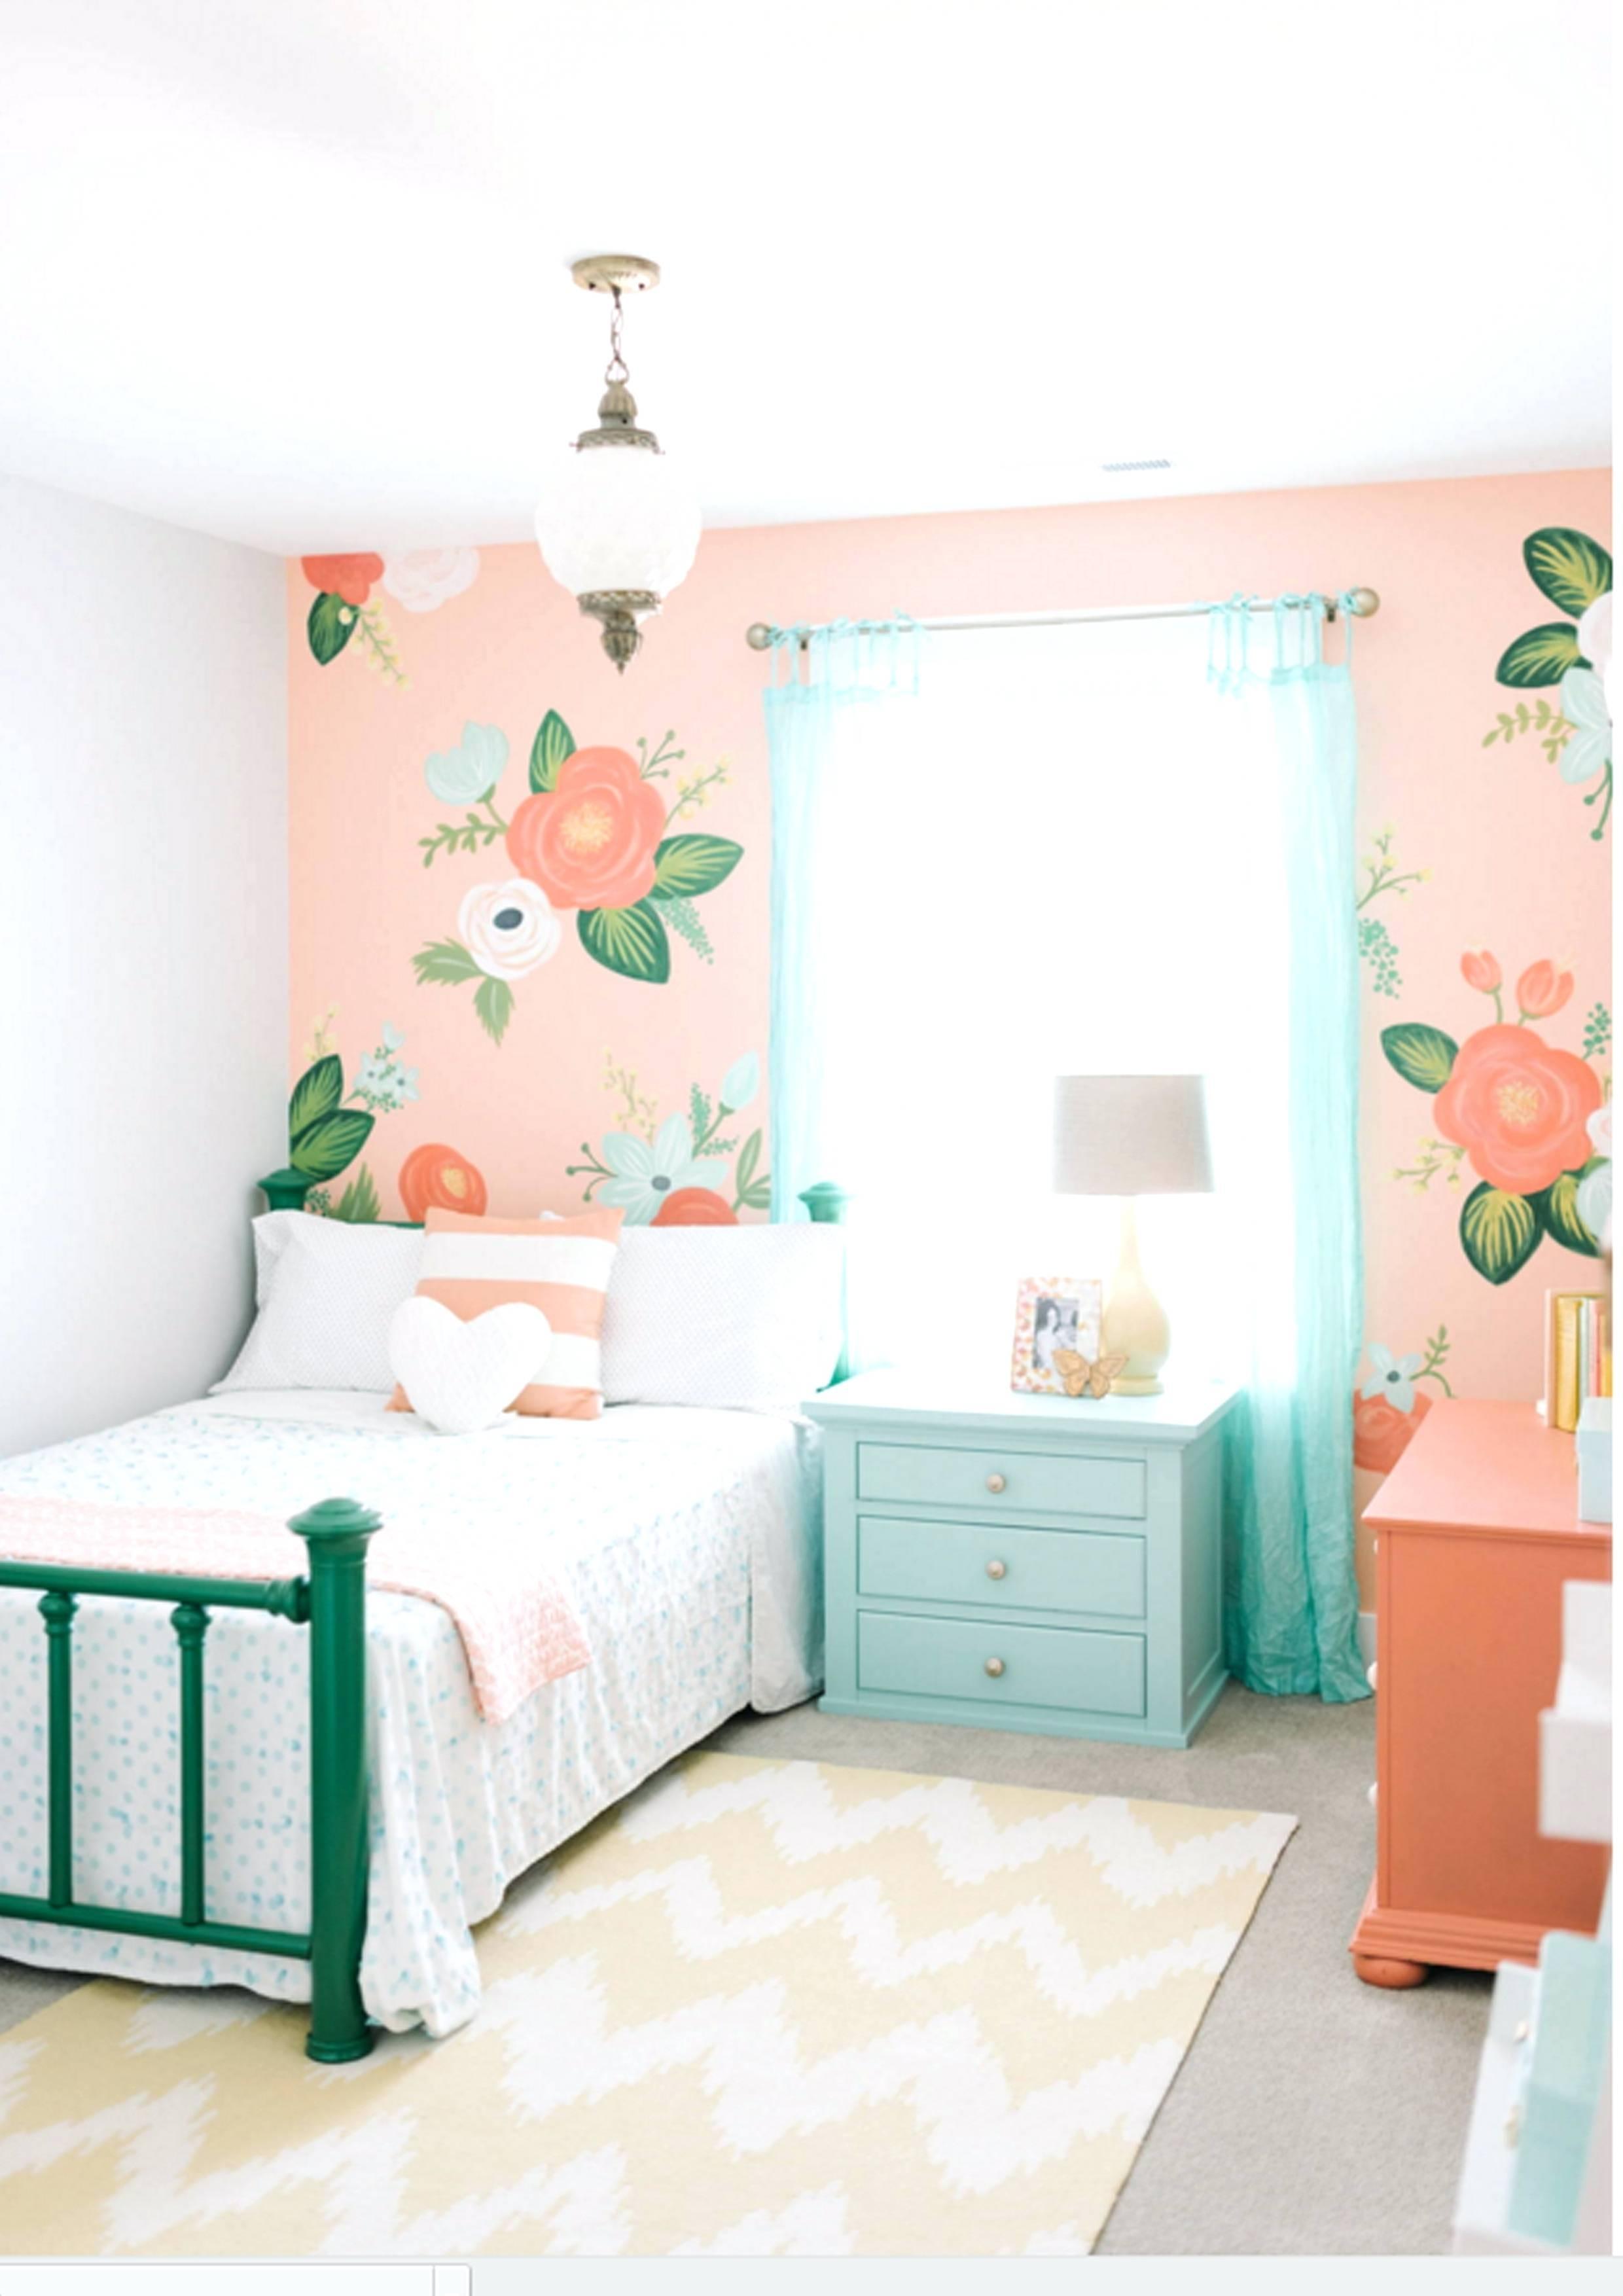 Diy Wall Decor Ideas For Bedroom Lovely Wall Arts Framed Wall Art In Most Popular Bedroom Framed Wall Art (View 20 of 20)